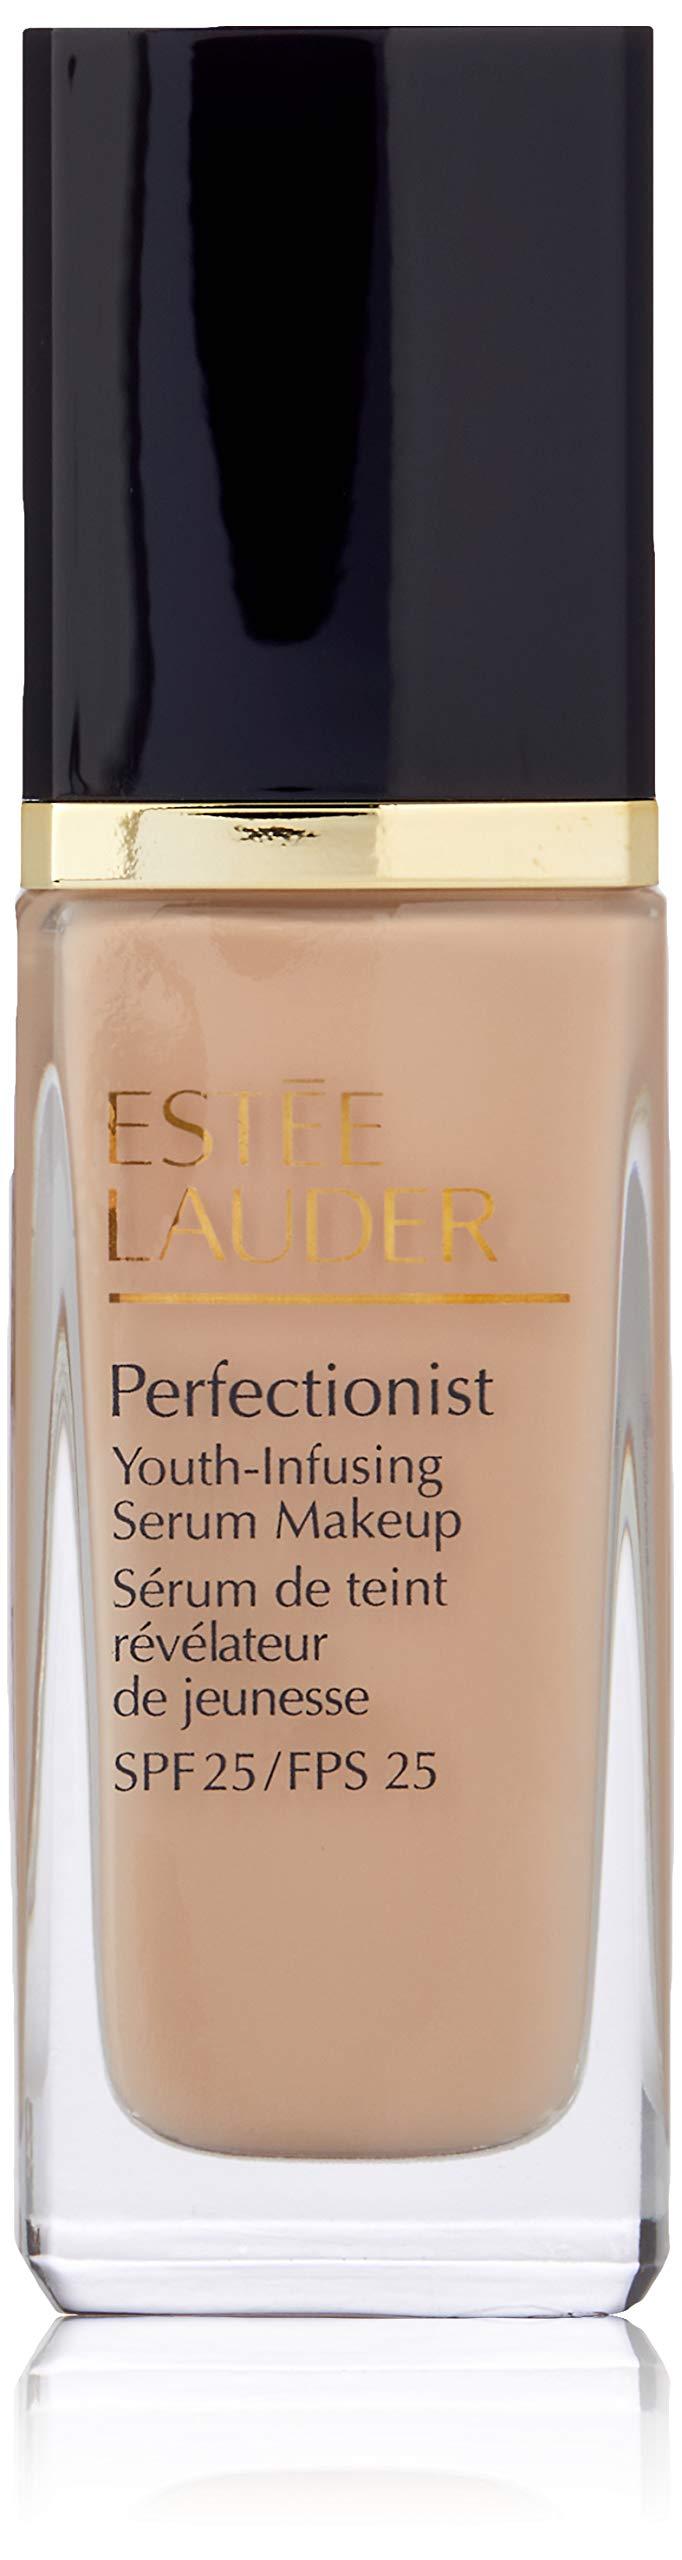 Estee Lauder 59843 – Base de maquillaje